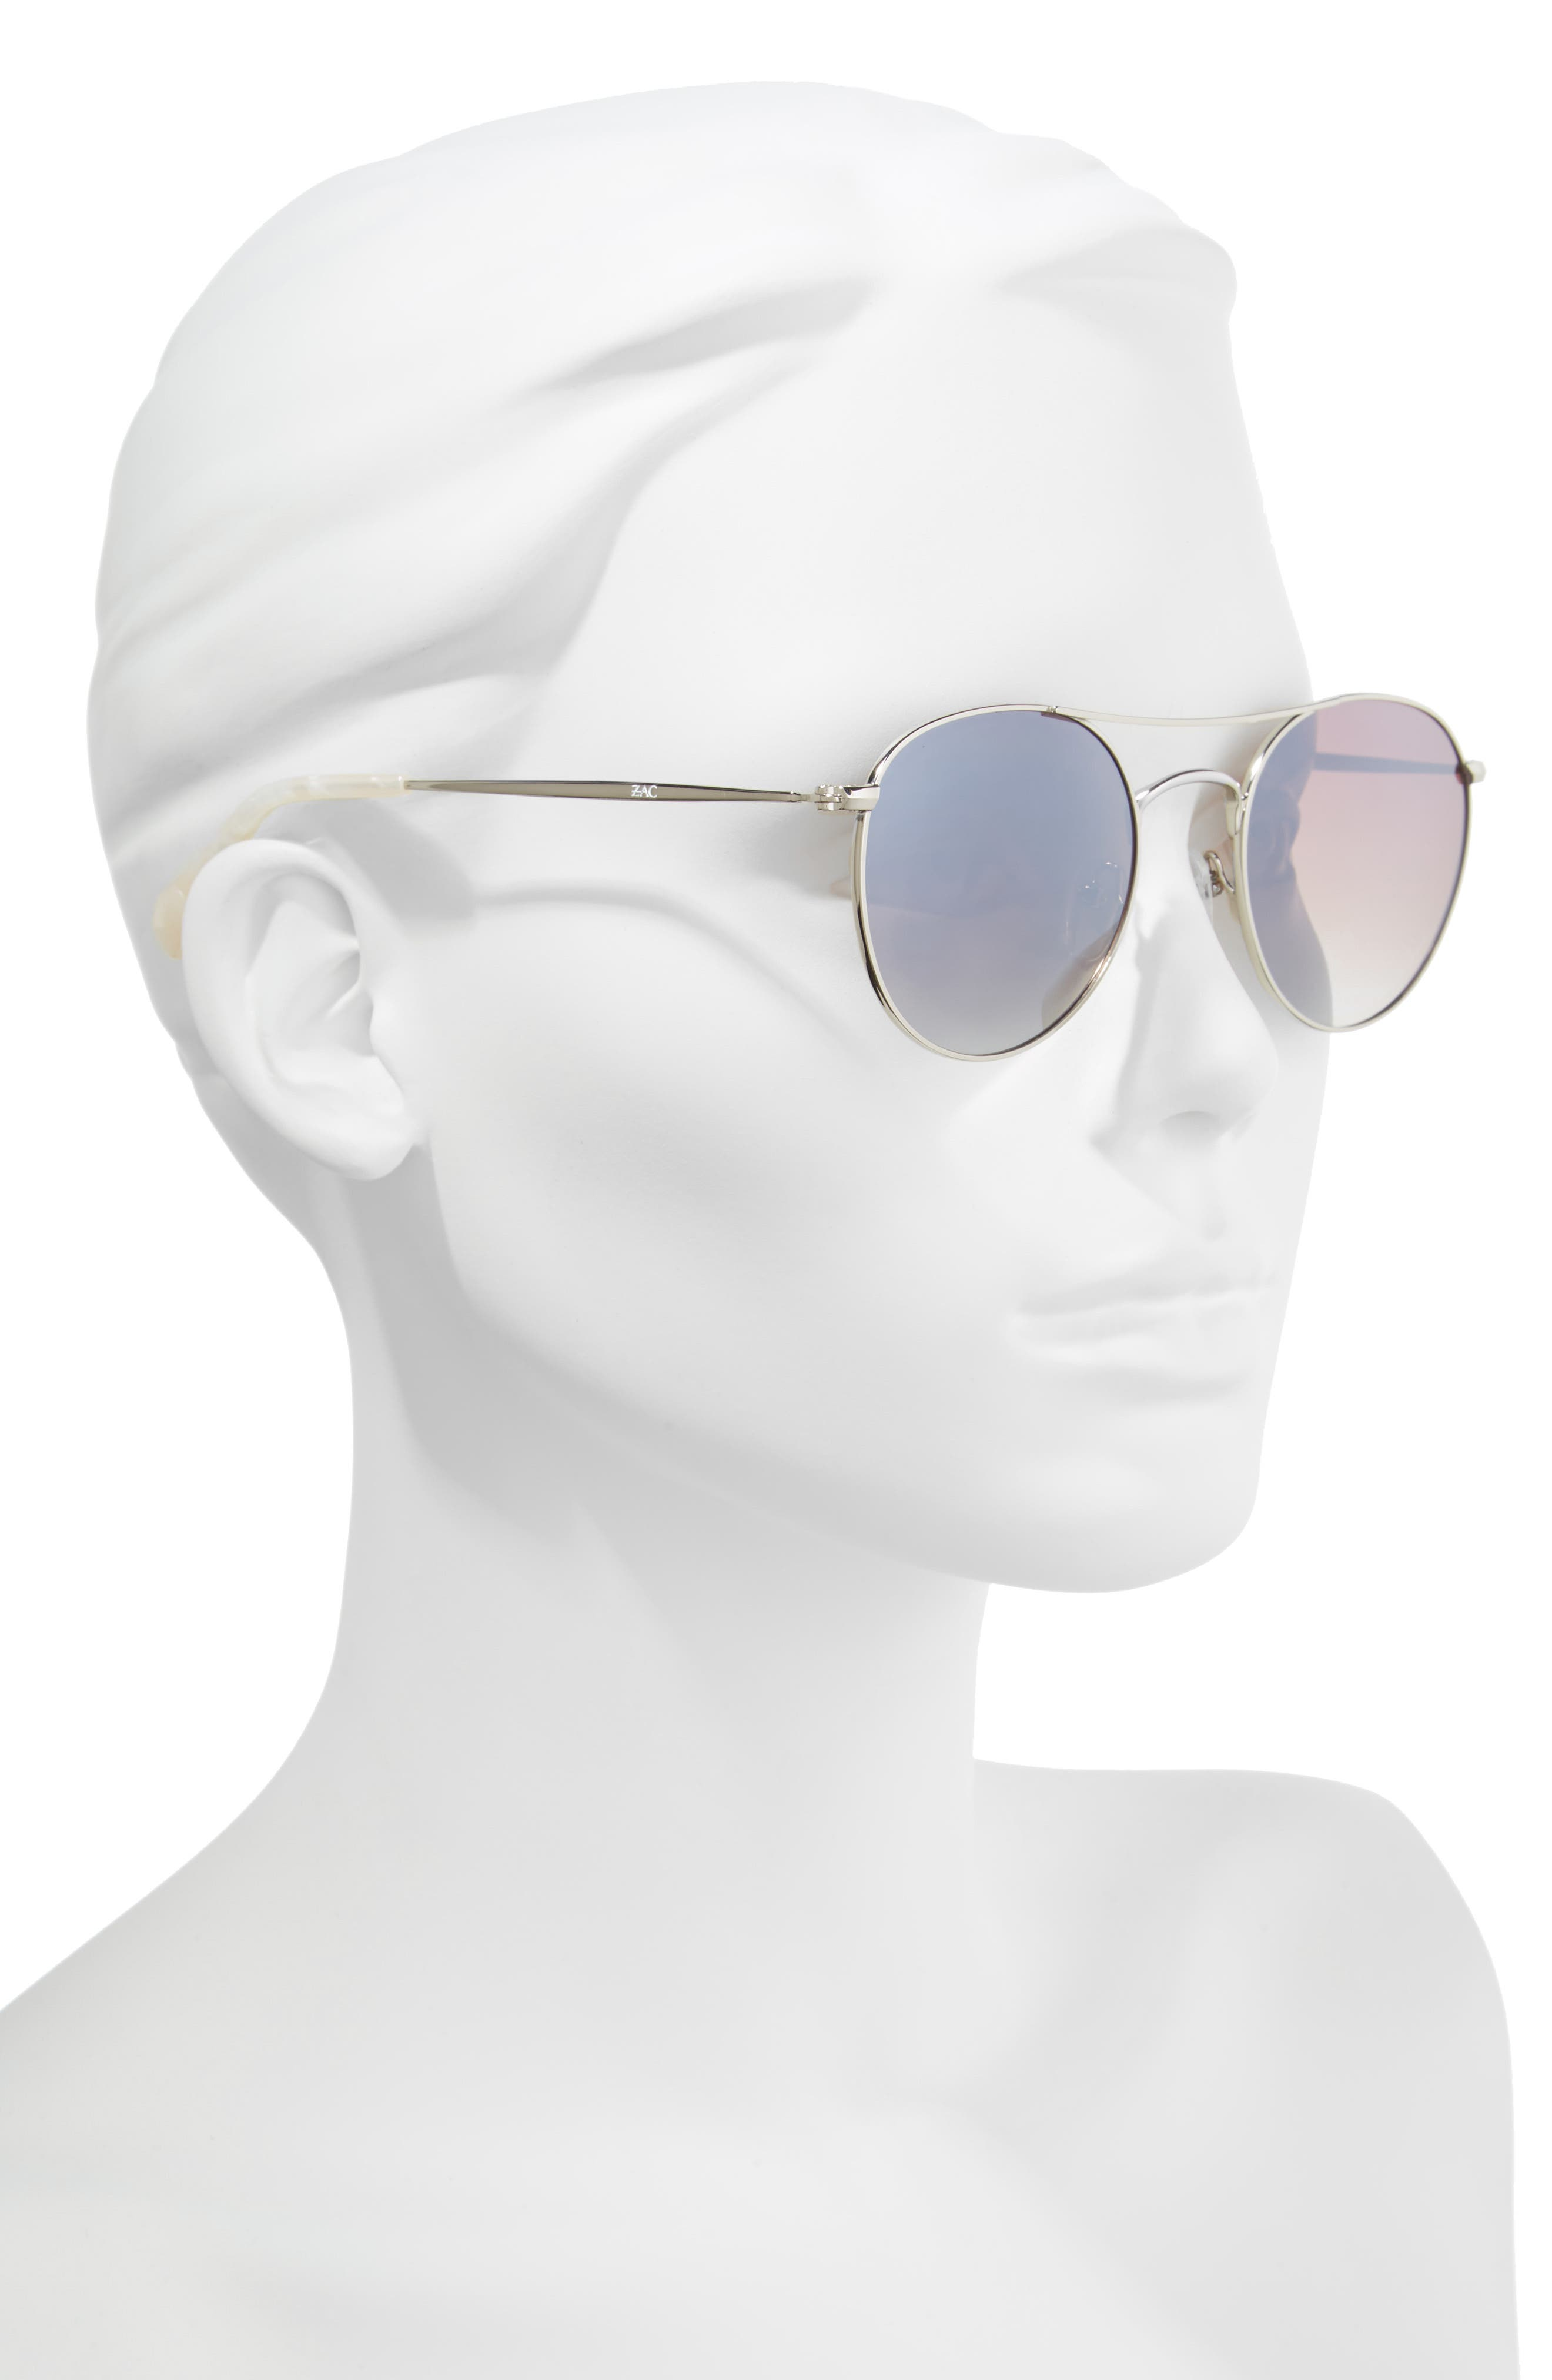 Juno 52mm Polarized Metal Aviator Sunglasses,                             Alternate thumbnail 2, color,                             SILVER POLAR/ BROWN